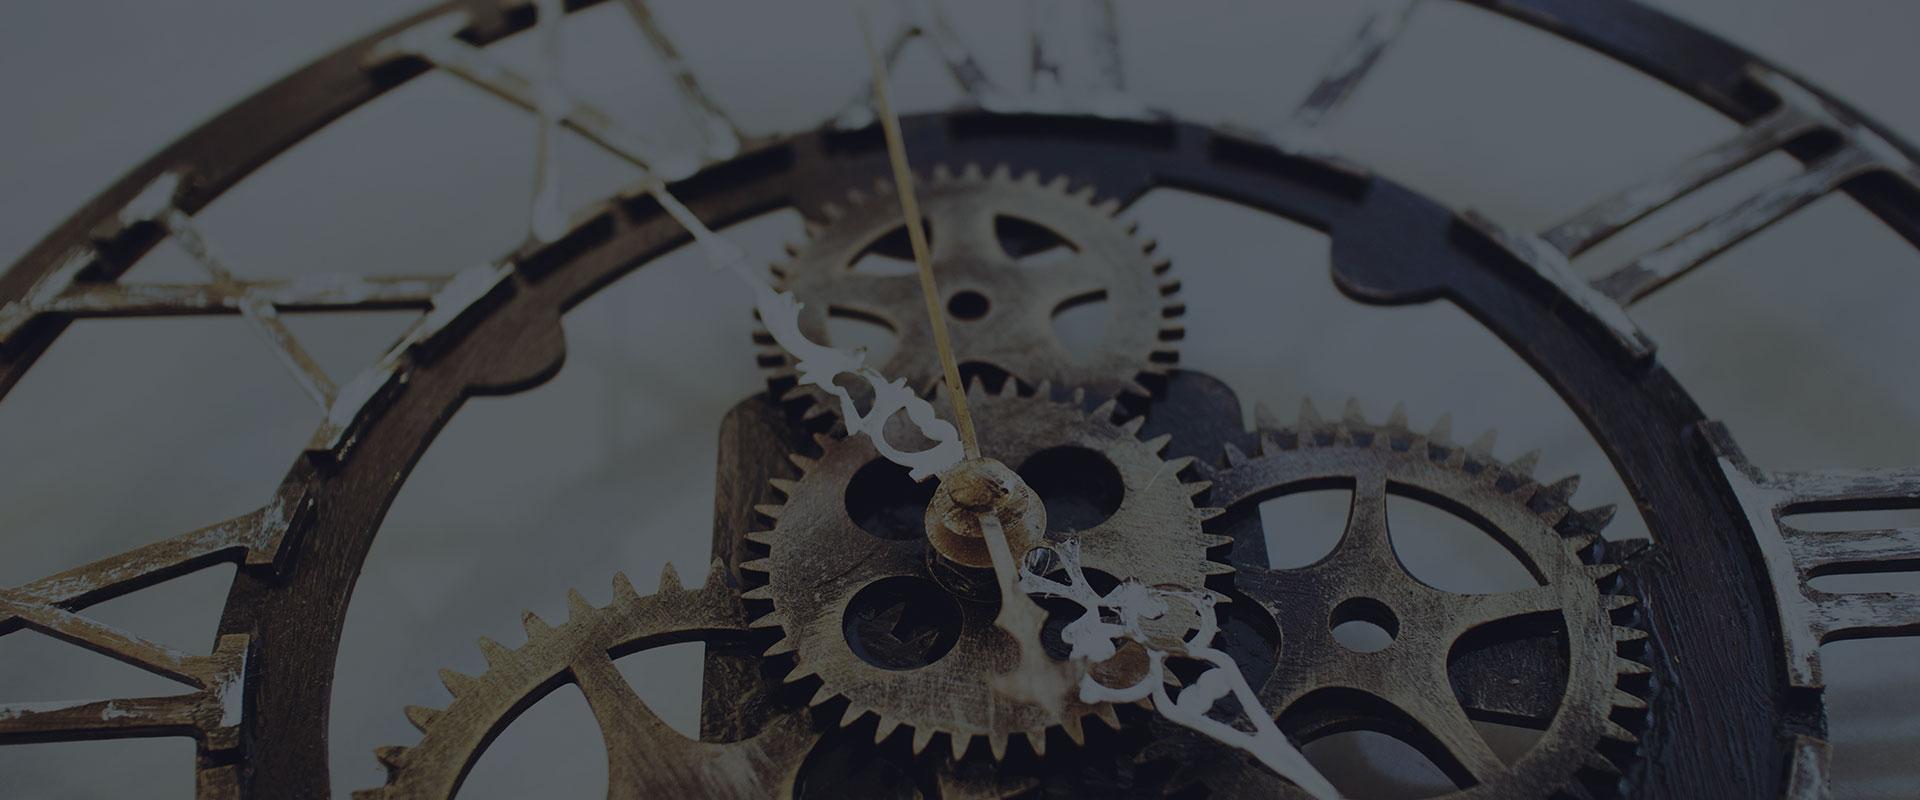 Grandfather Clock Repair Restoration For Grandfather Clocks